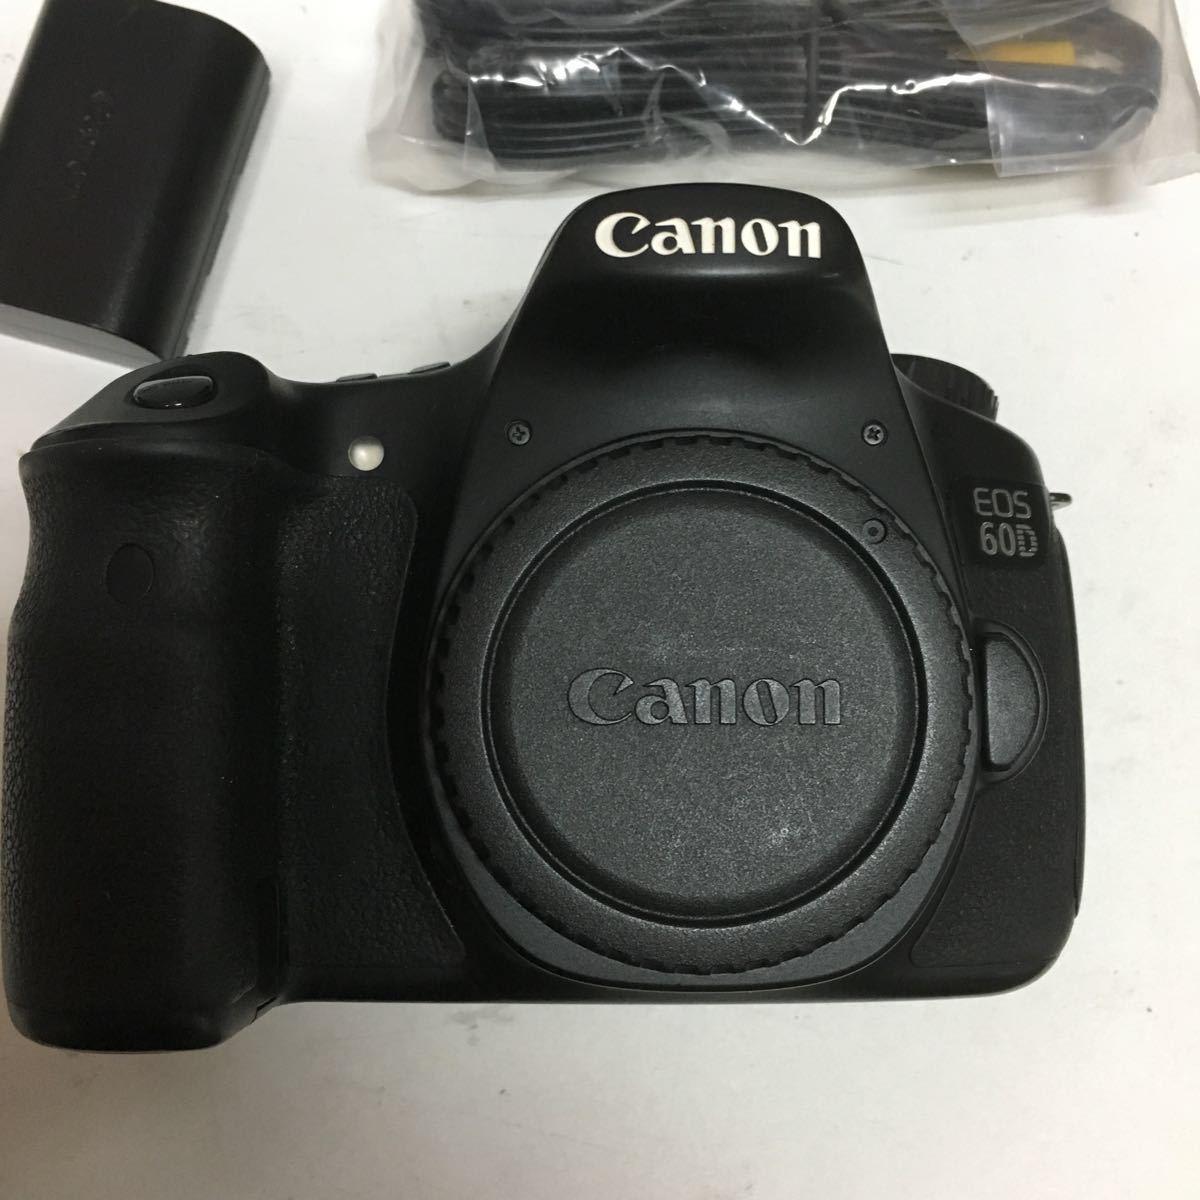 Canon デジタル一眼レフカメラ EOS 60D ボディ EOS60D_画像3